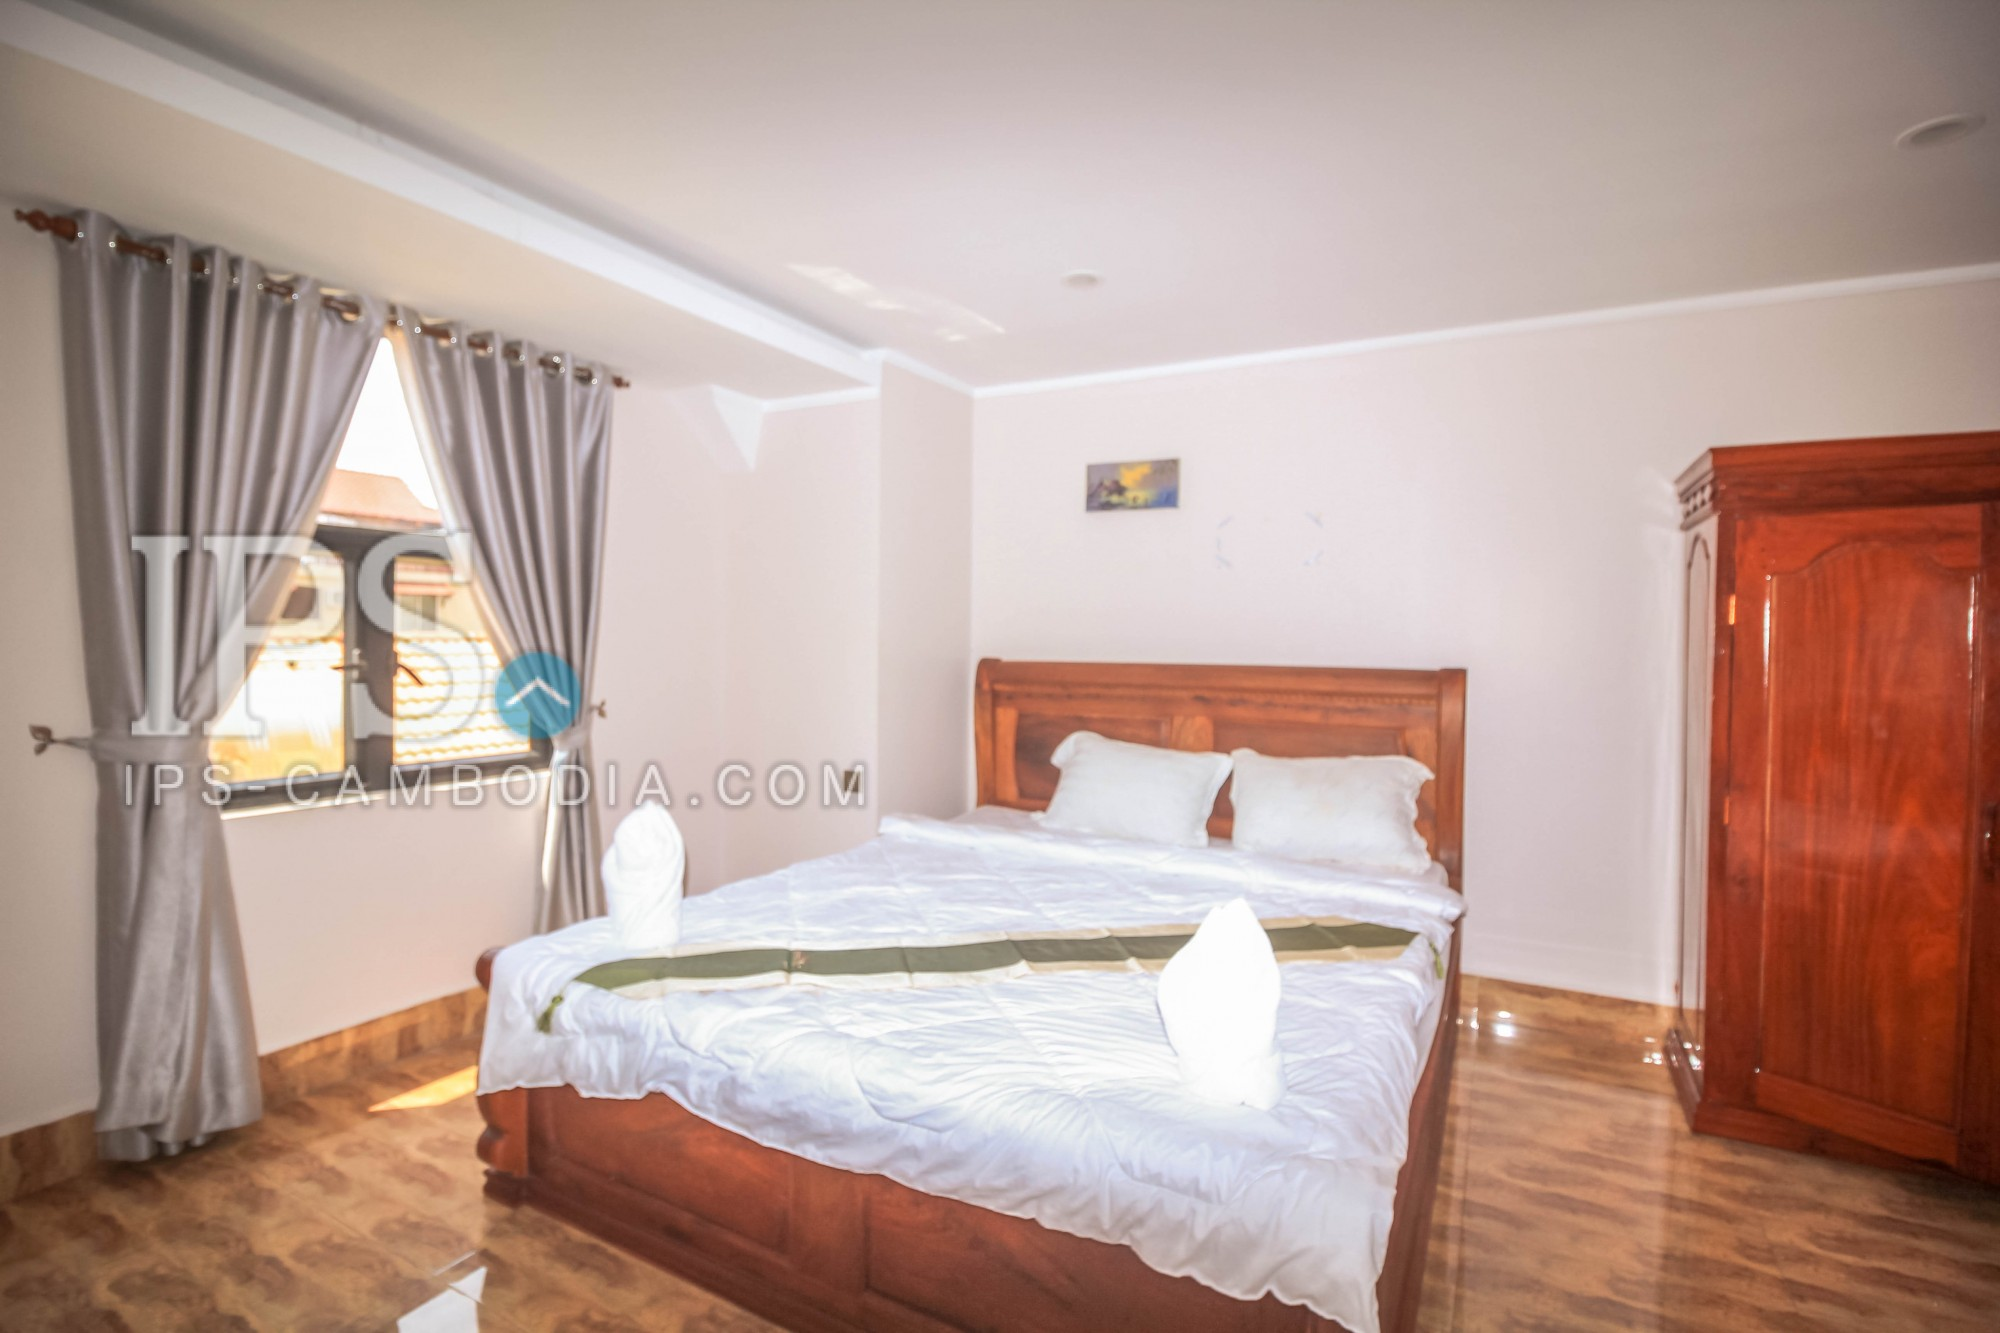 16 Bedrooms Apartment Building  For Rent - Siem Reap